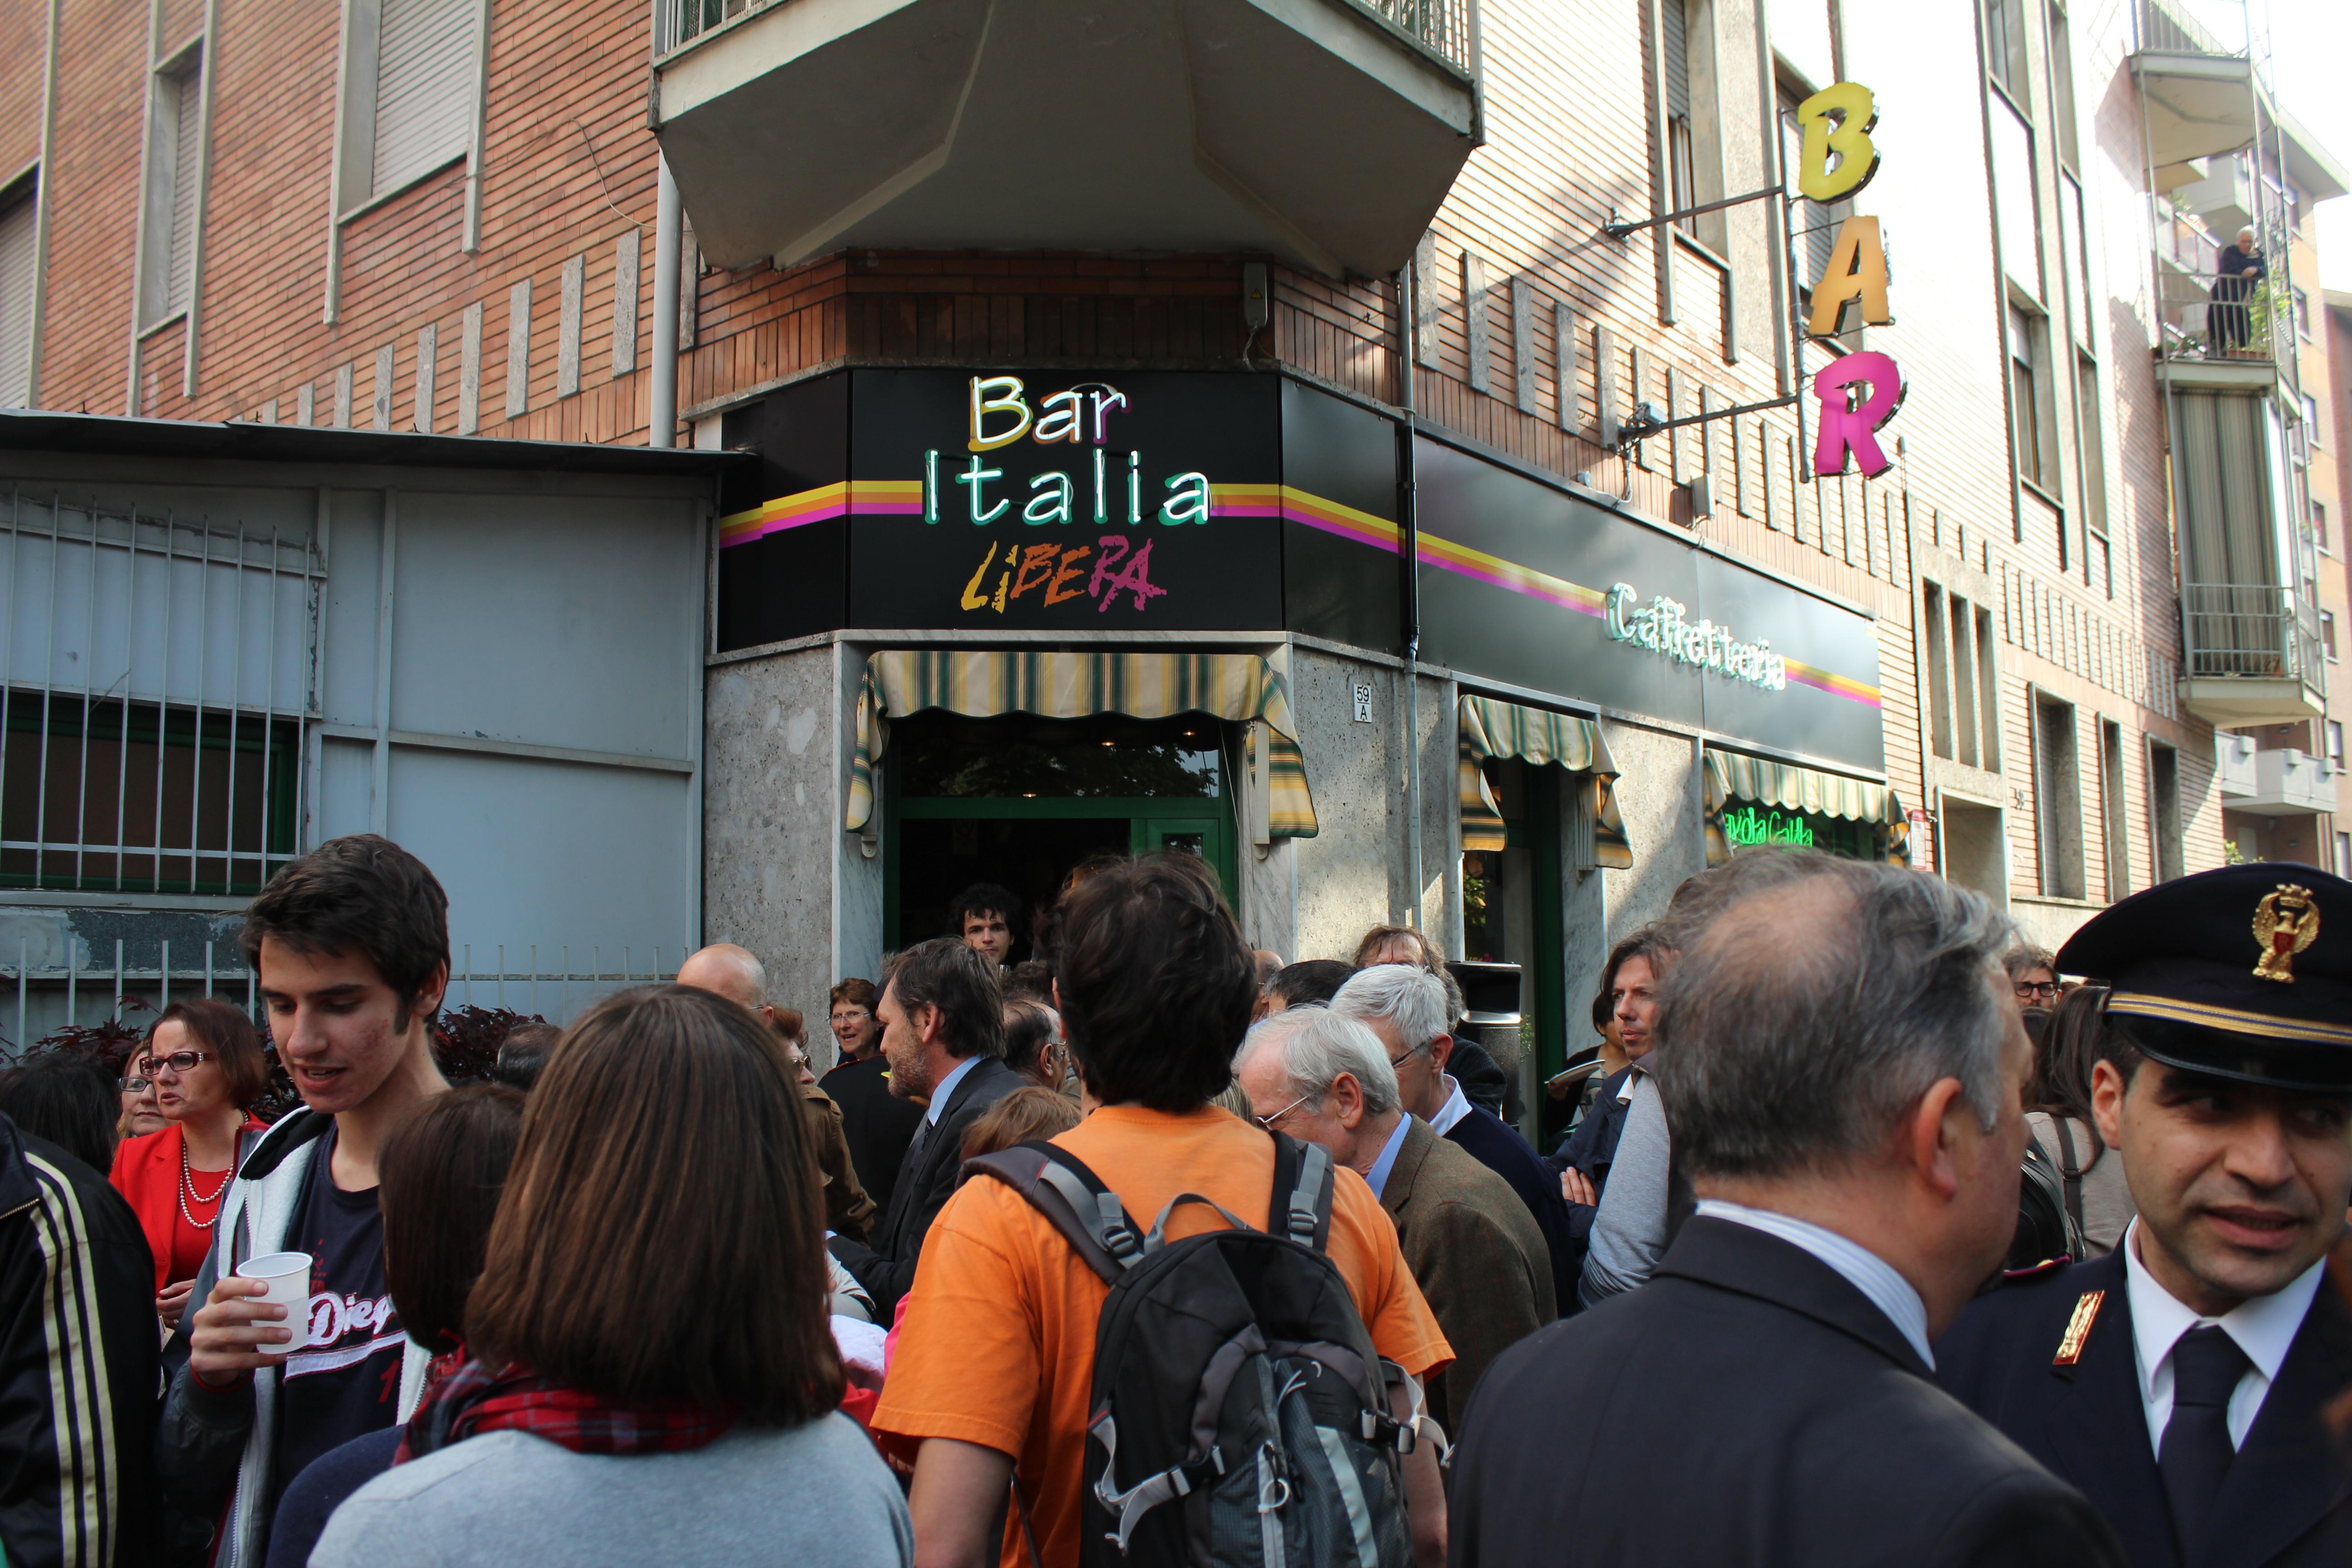 Torino, Bar Italia Libera.